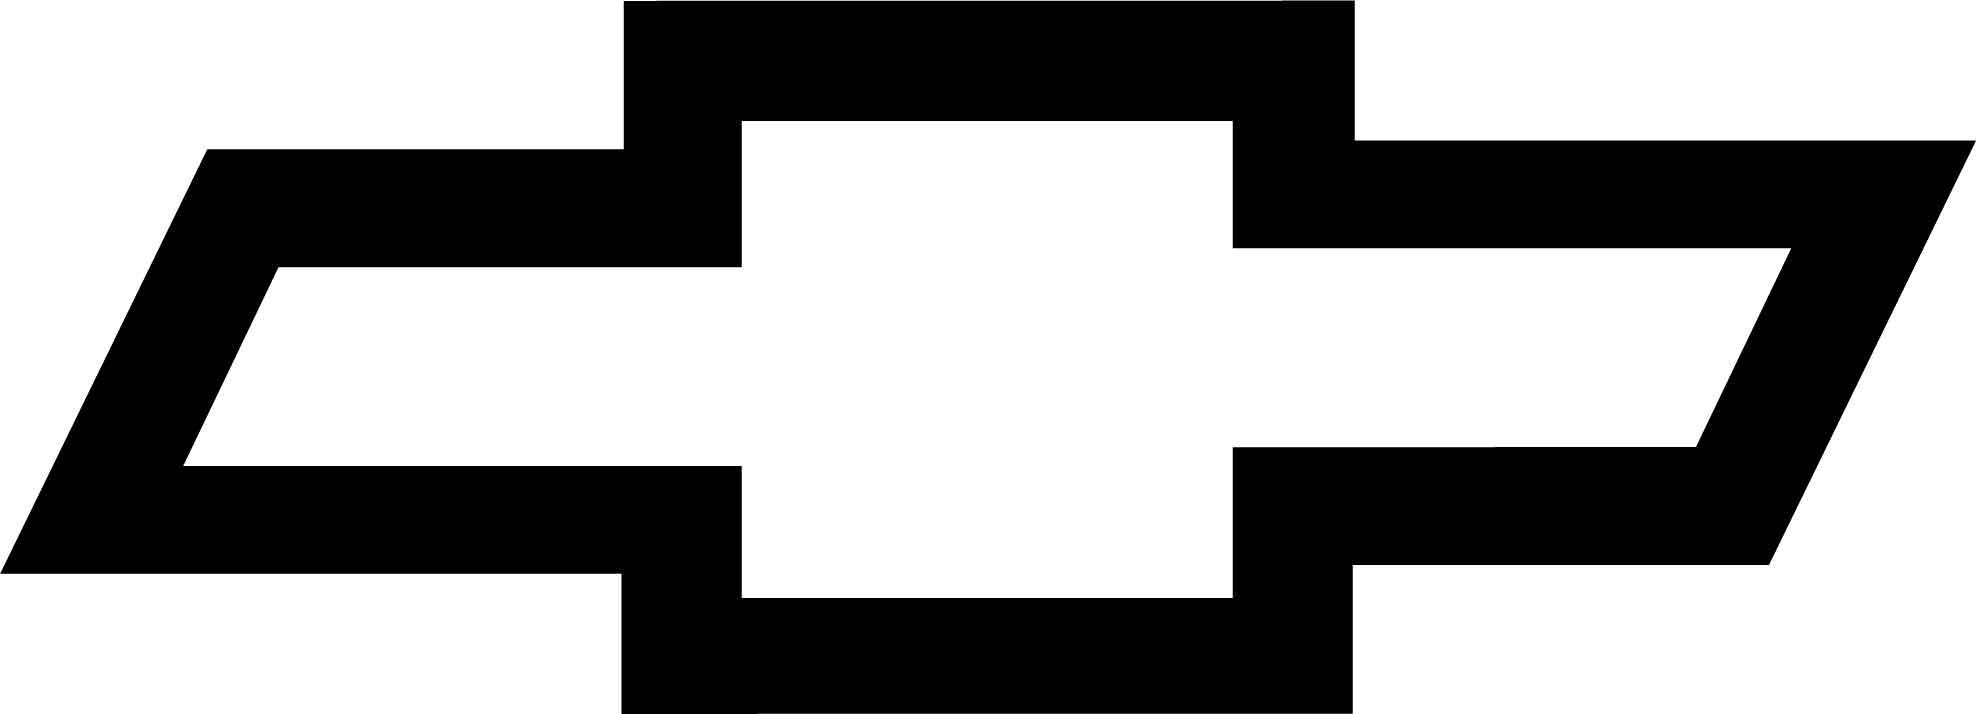 chevy emblem clip art - Clipground (1977 x 714 Pixel)